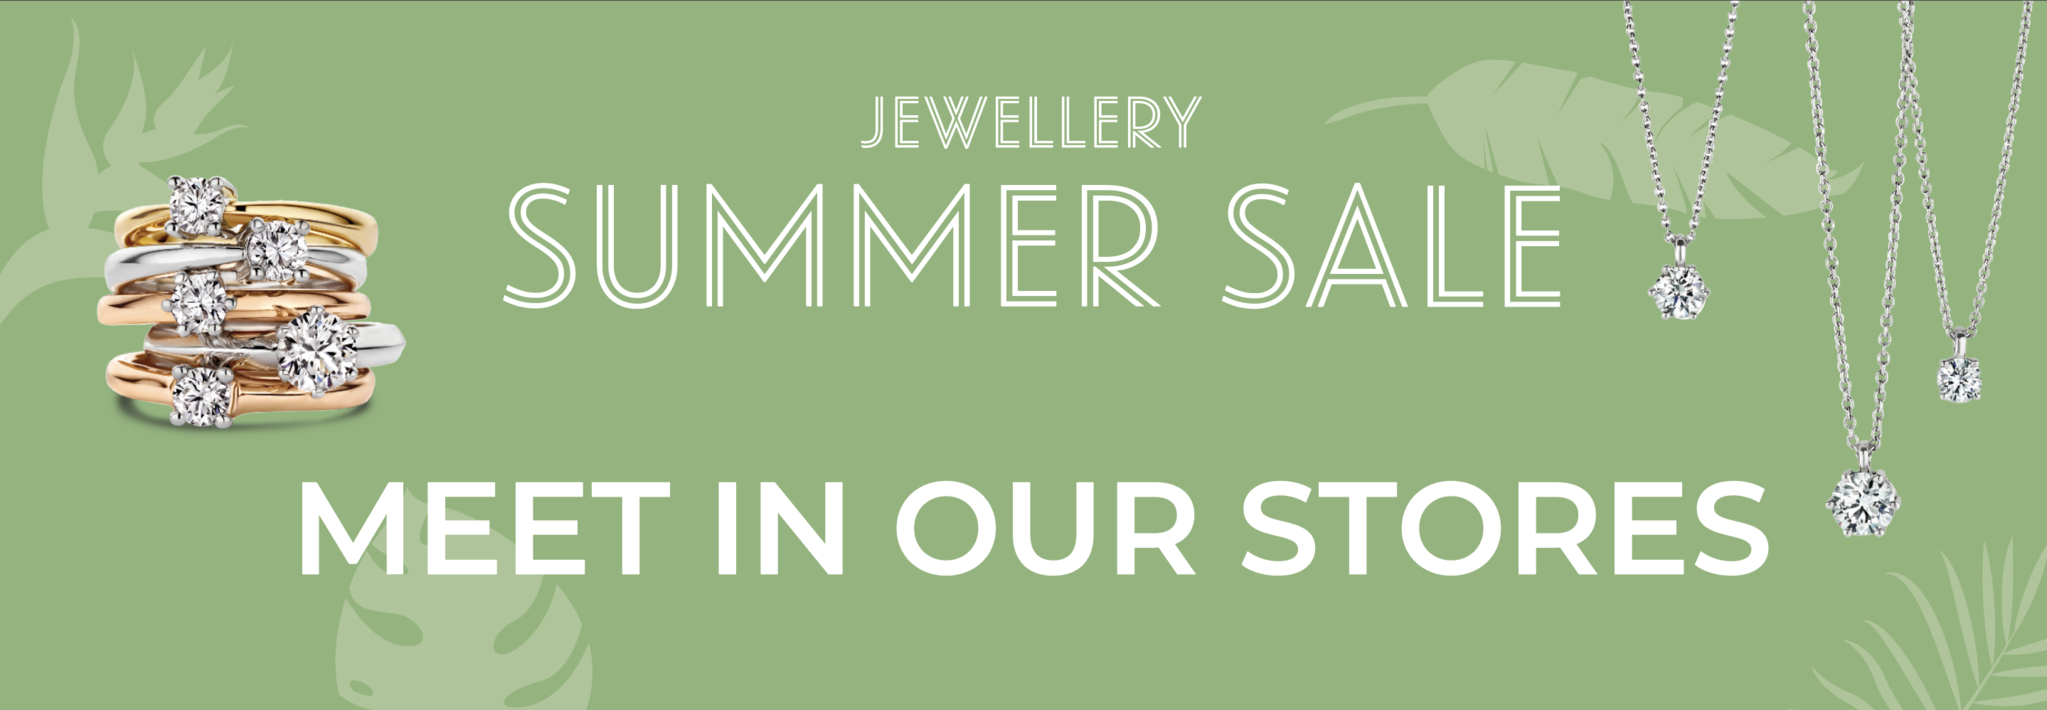 Schaap en Citroen Jewellery Summer Sale